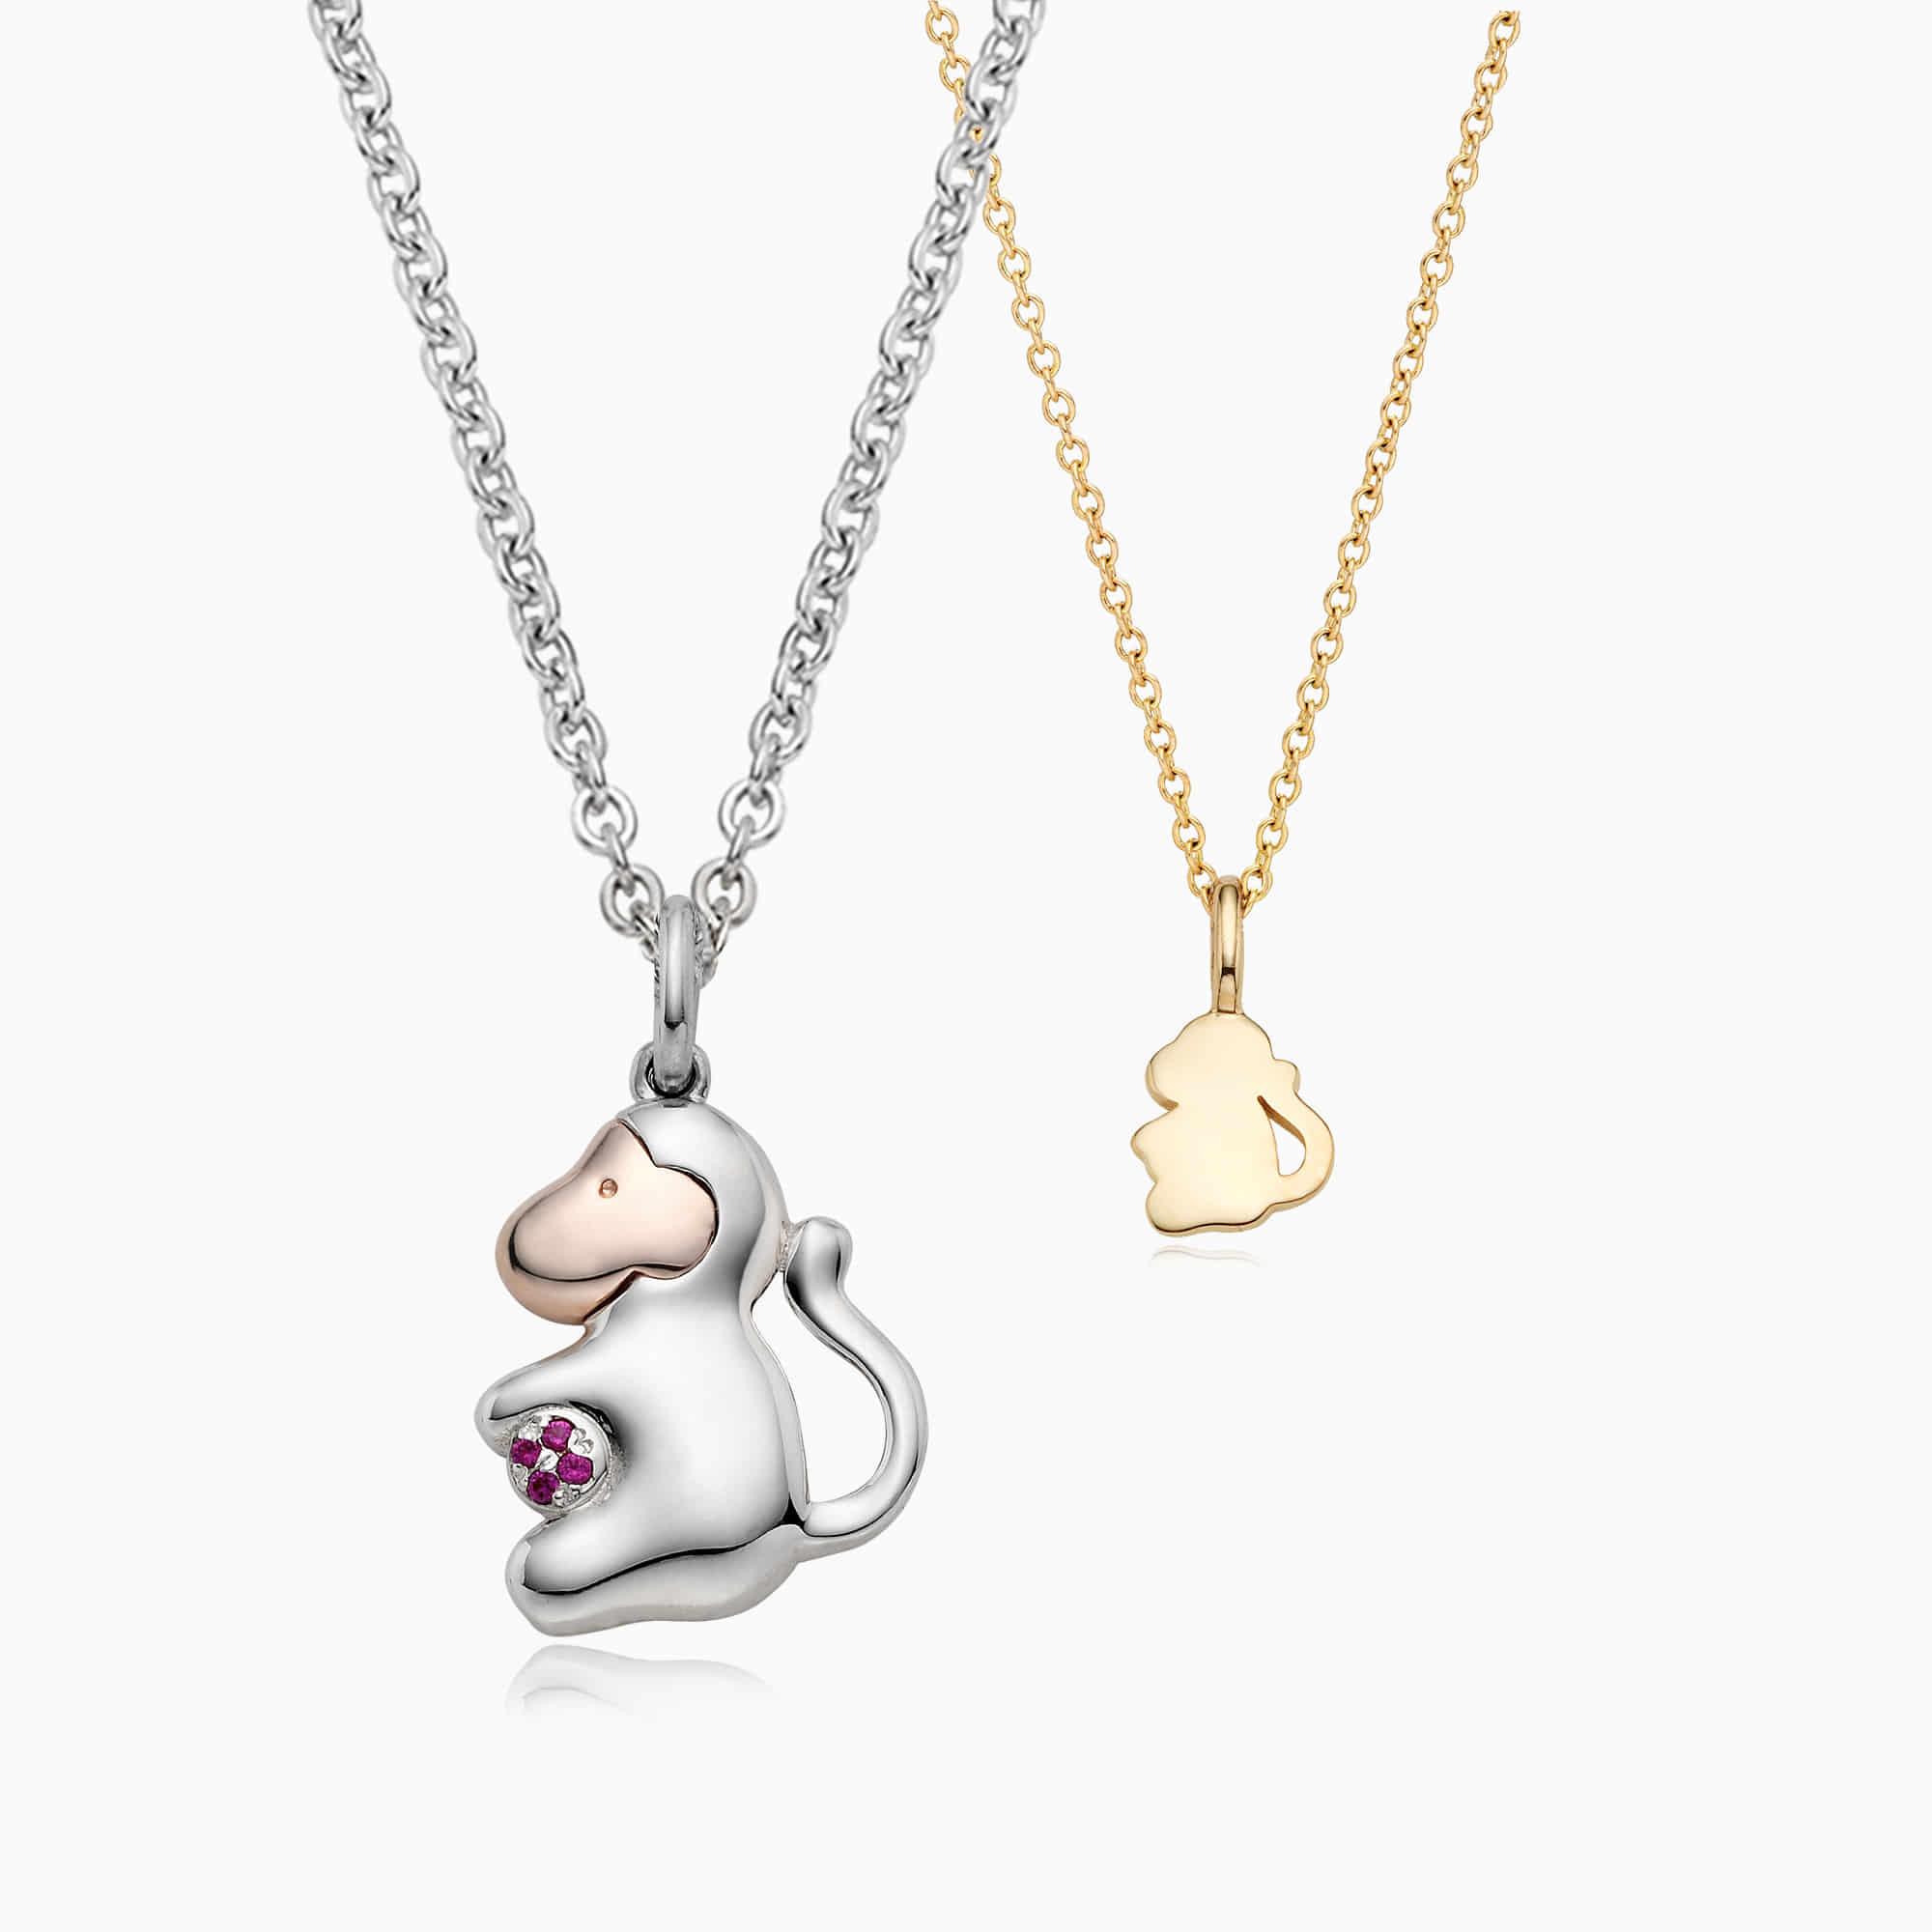 [With My Child] Silver/ 14K/18K 12 Zodiac Necklace